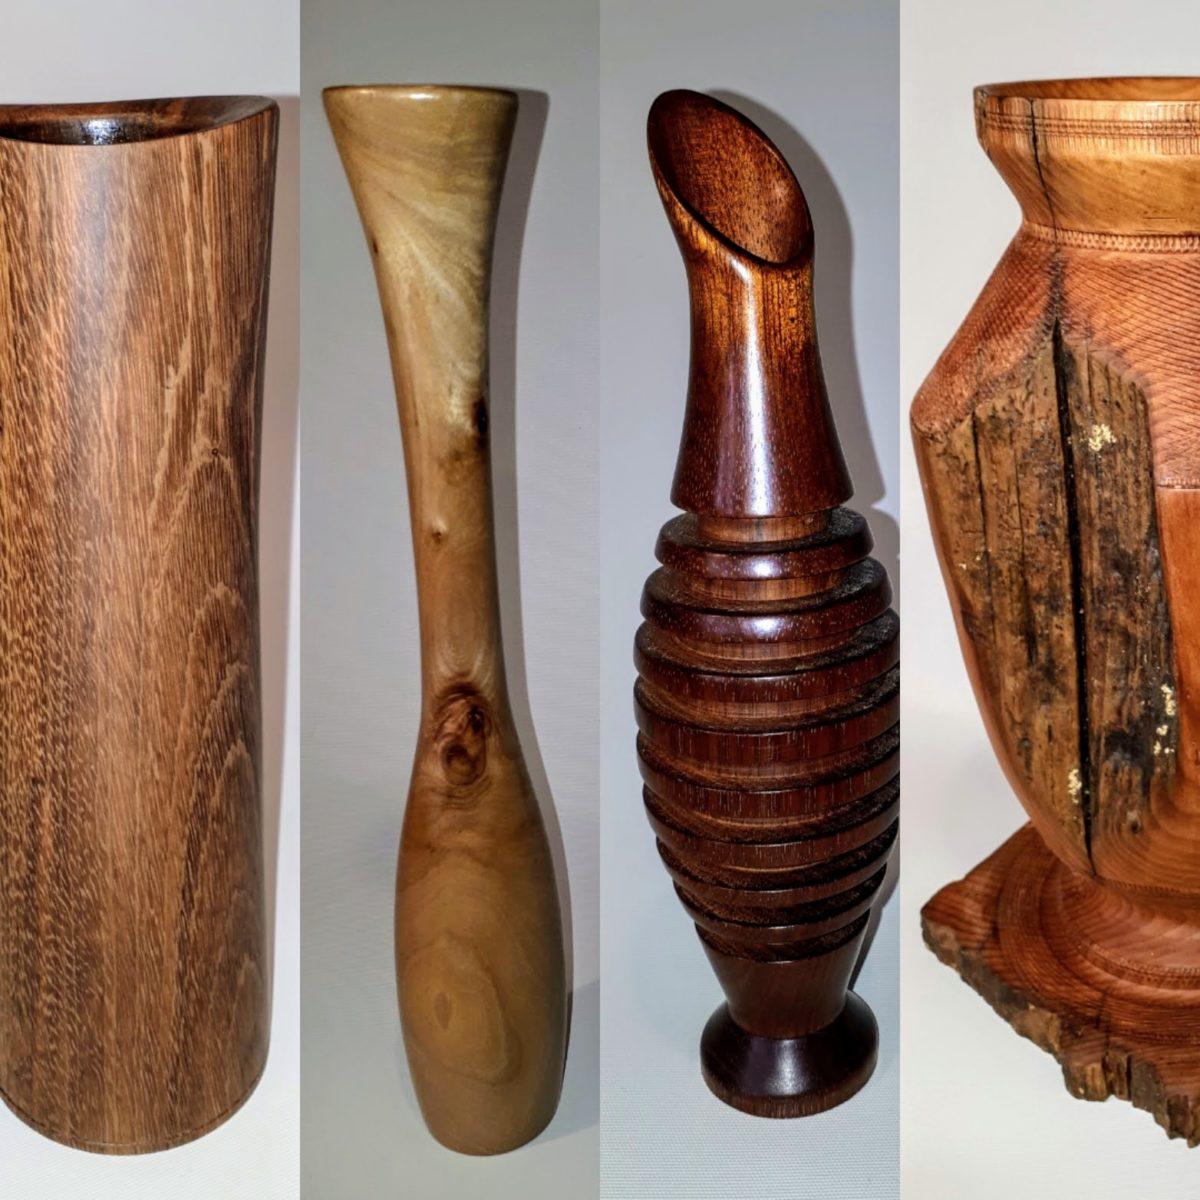 Woodturned flower vases